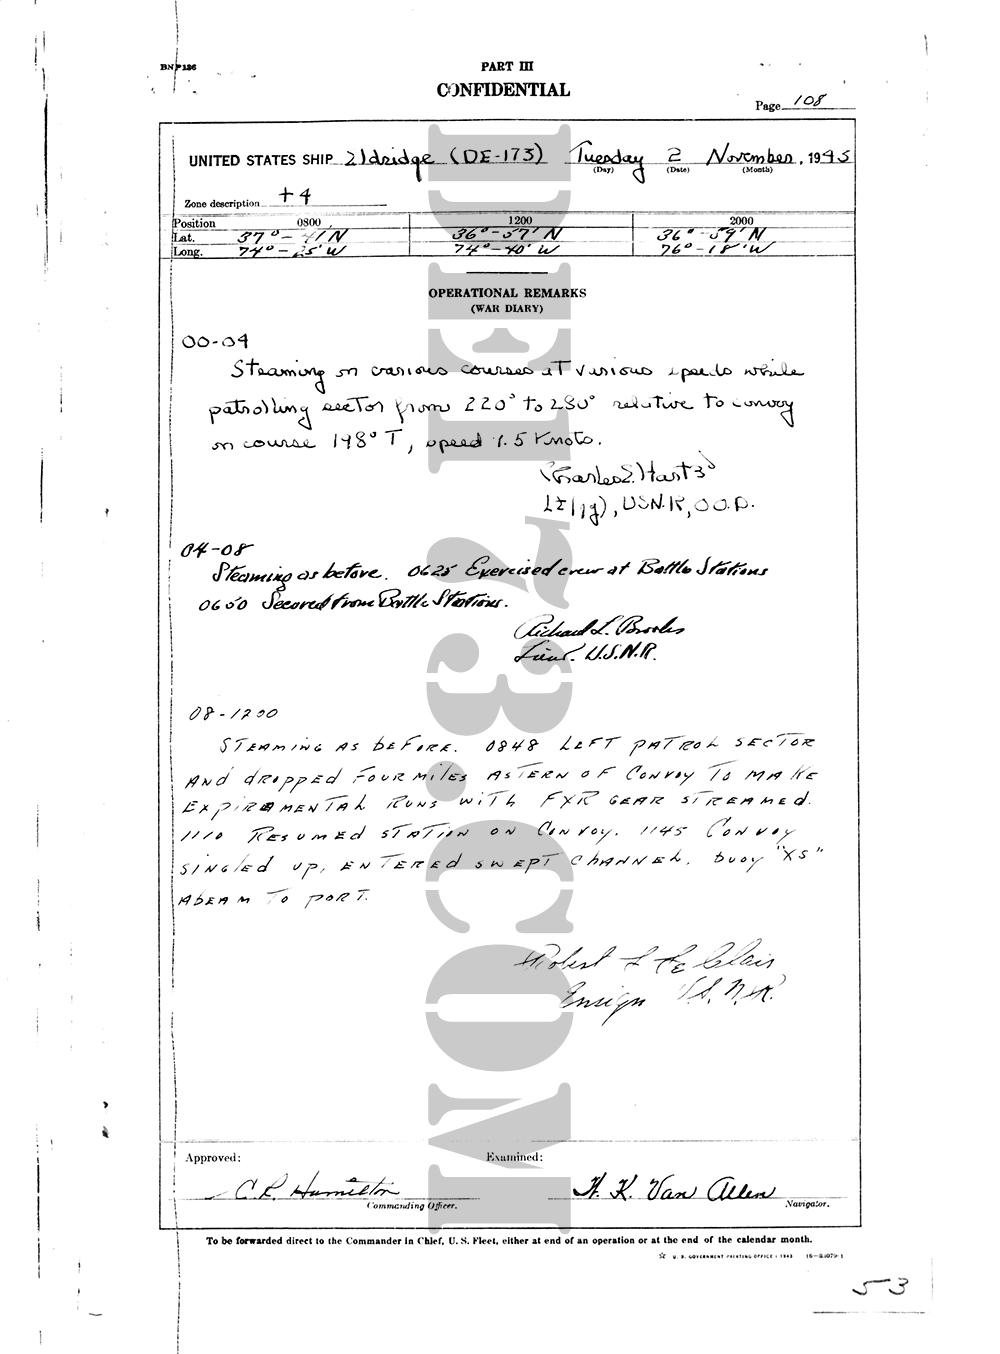 USS Eldridge Microfilm Page 108 / November 2, 1943